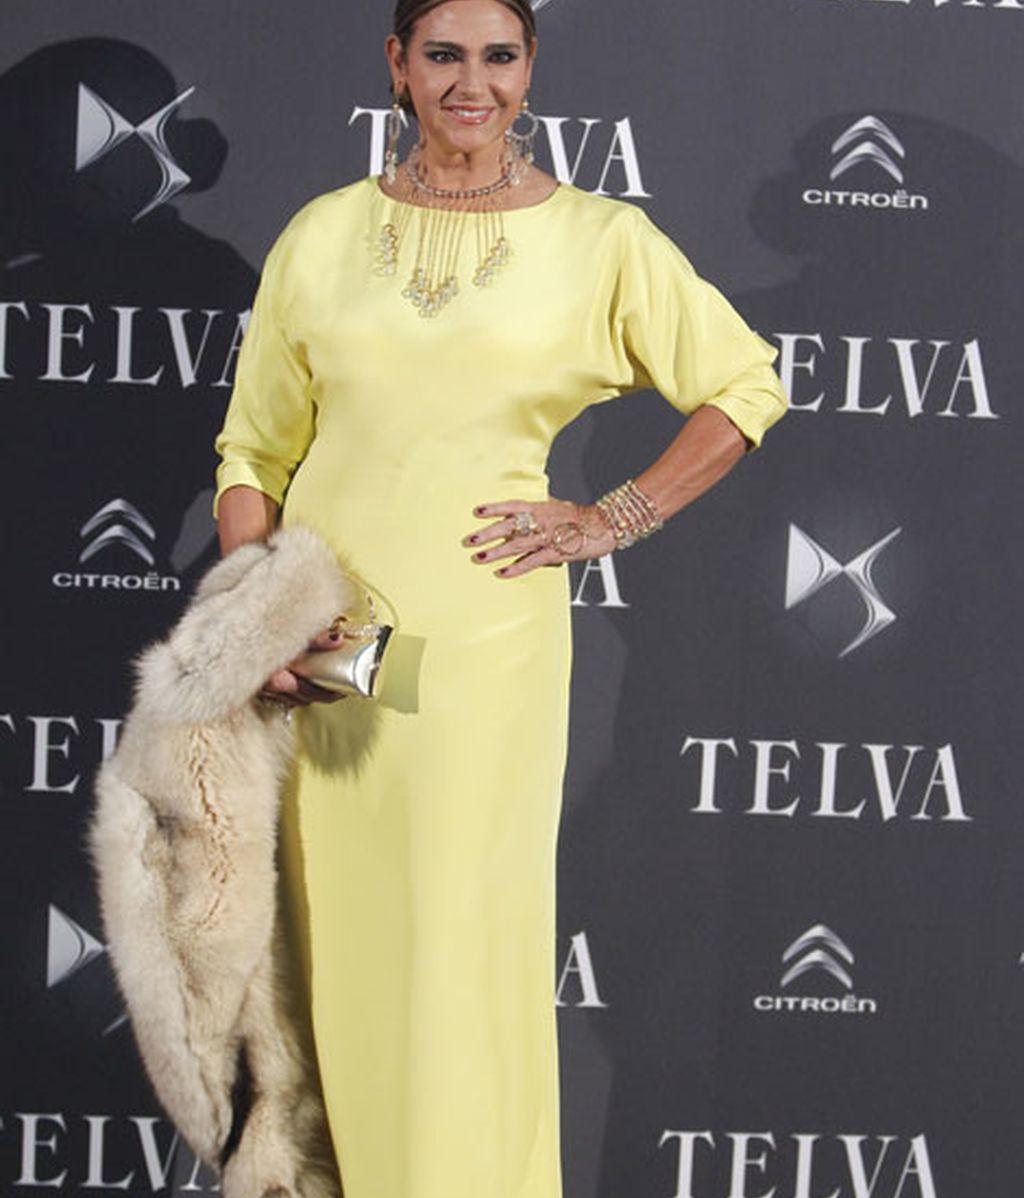 Marina Danko eligió un vestido amarillo